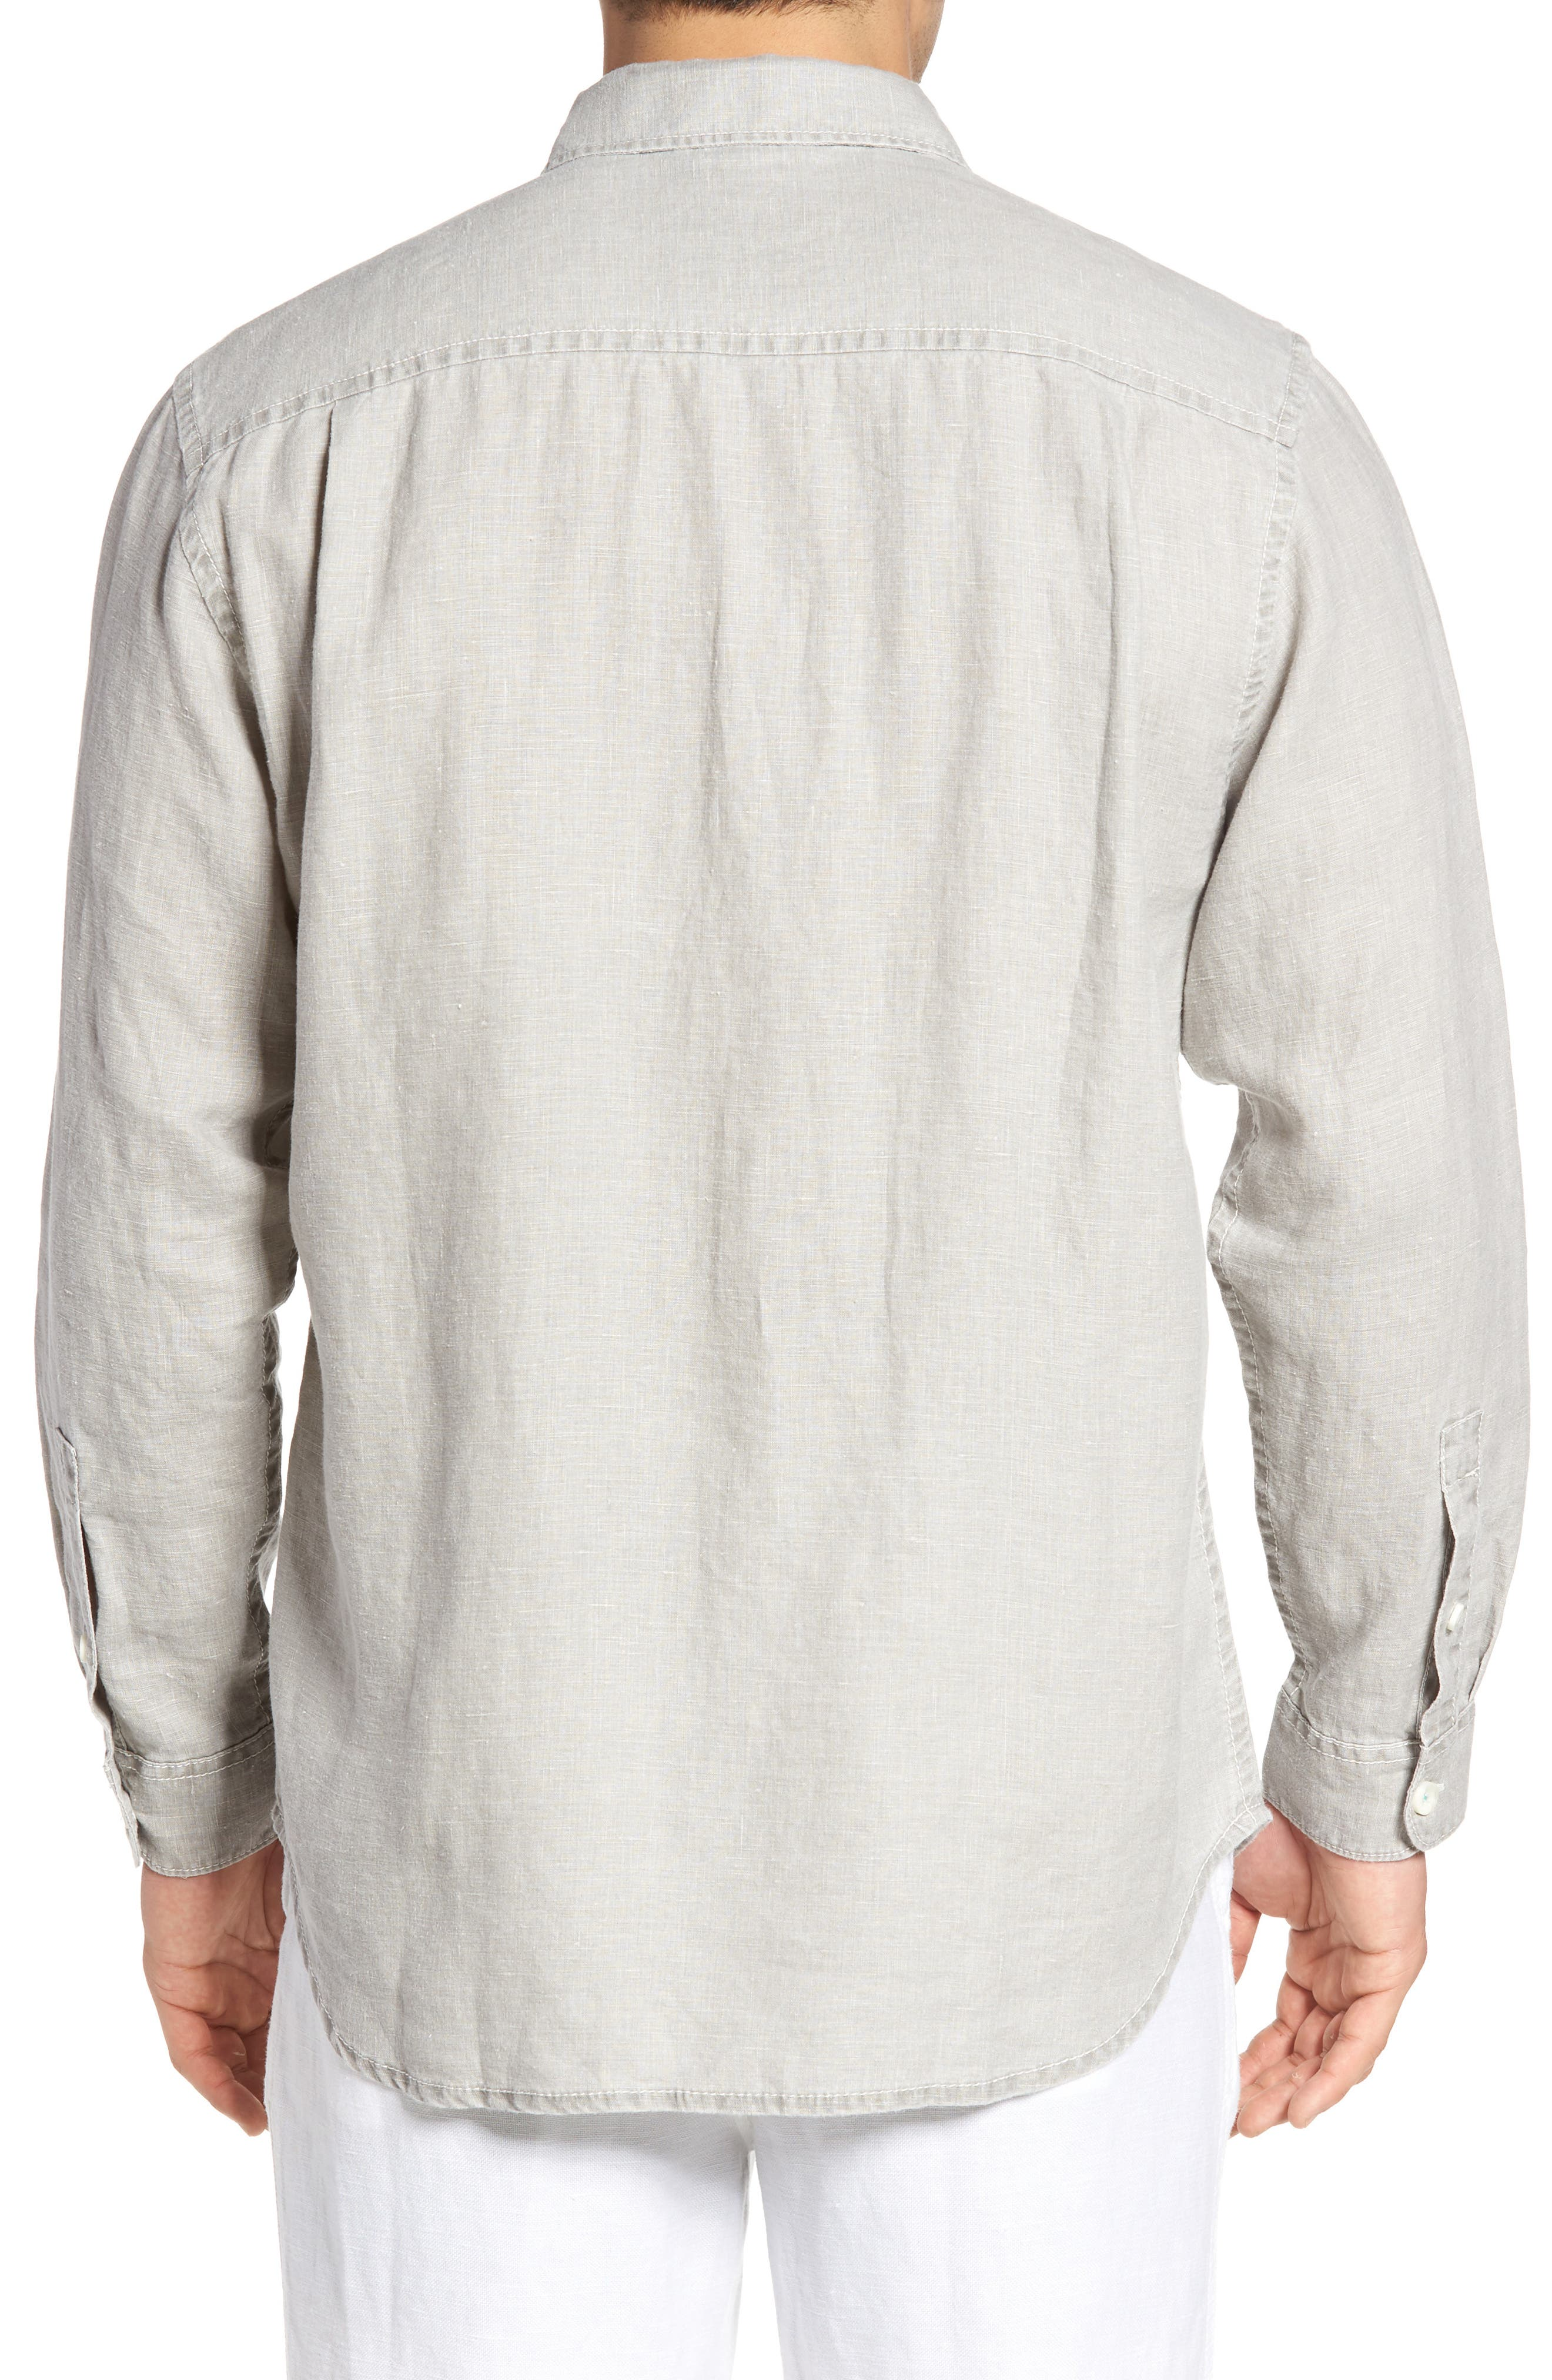 'Sea Glass Breezer' Original Fit Linen Shirt,                             Alternate thumbnail 2, color,                             050